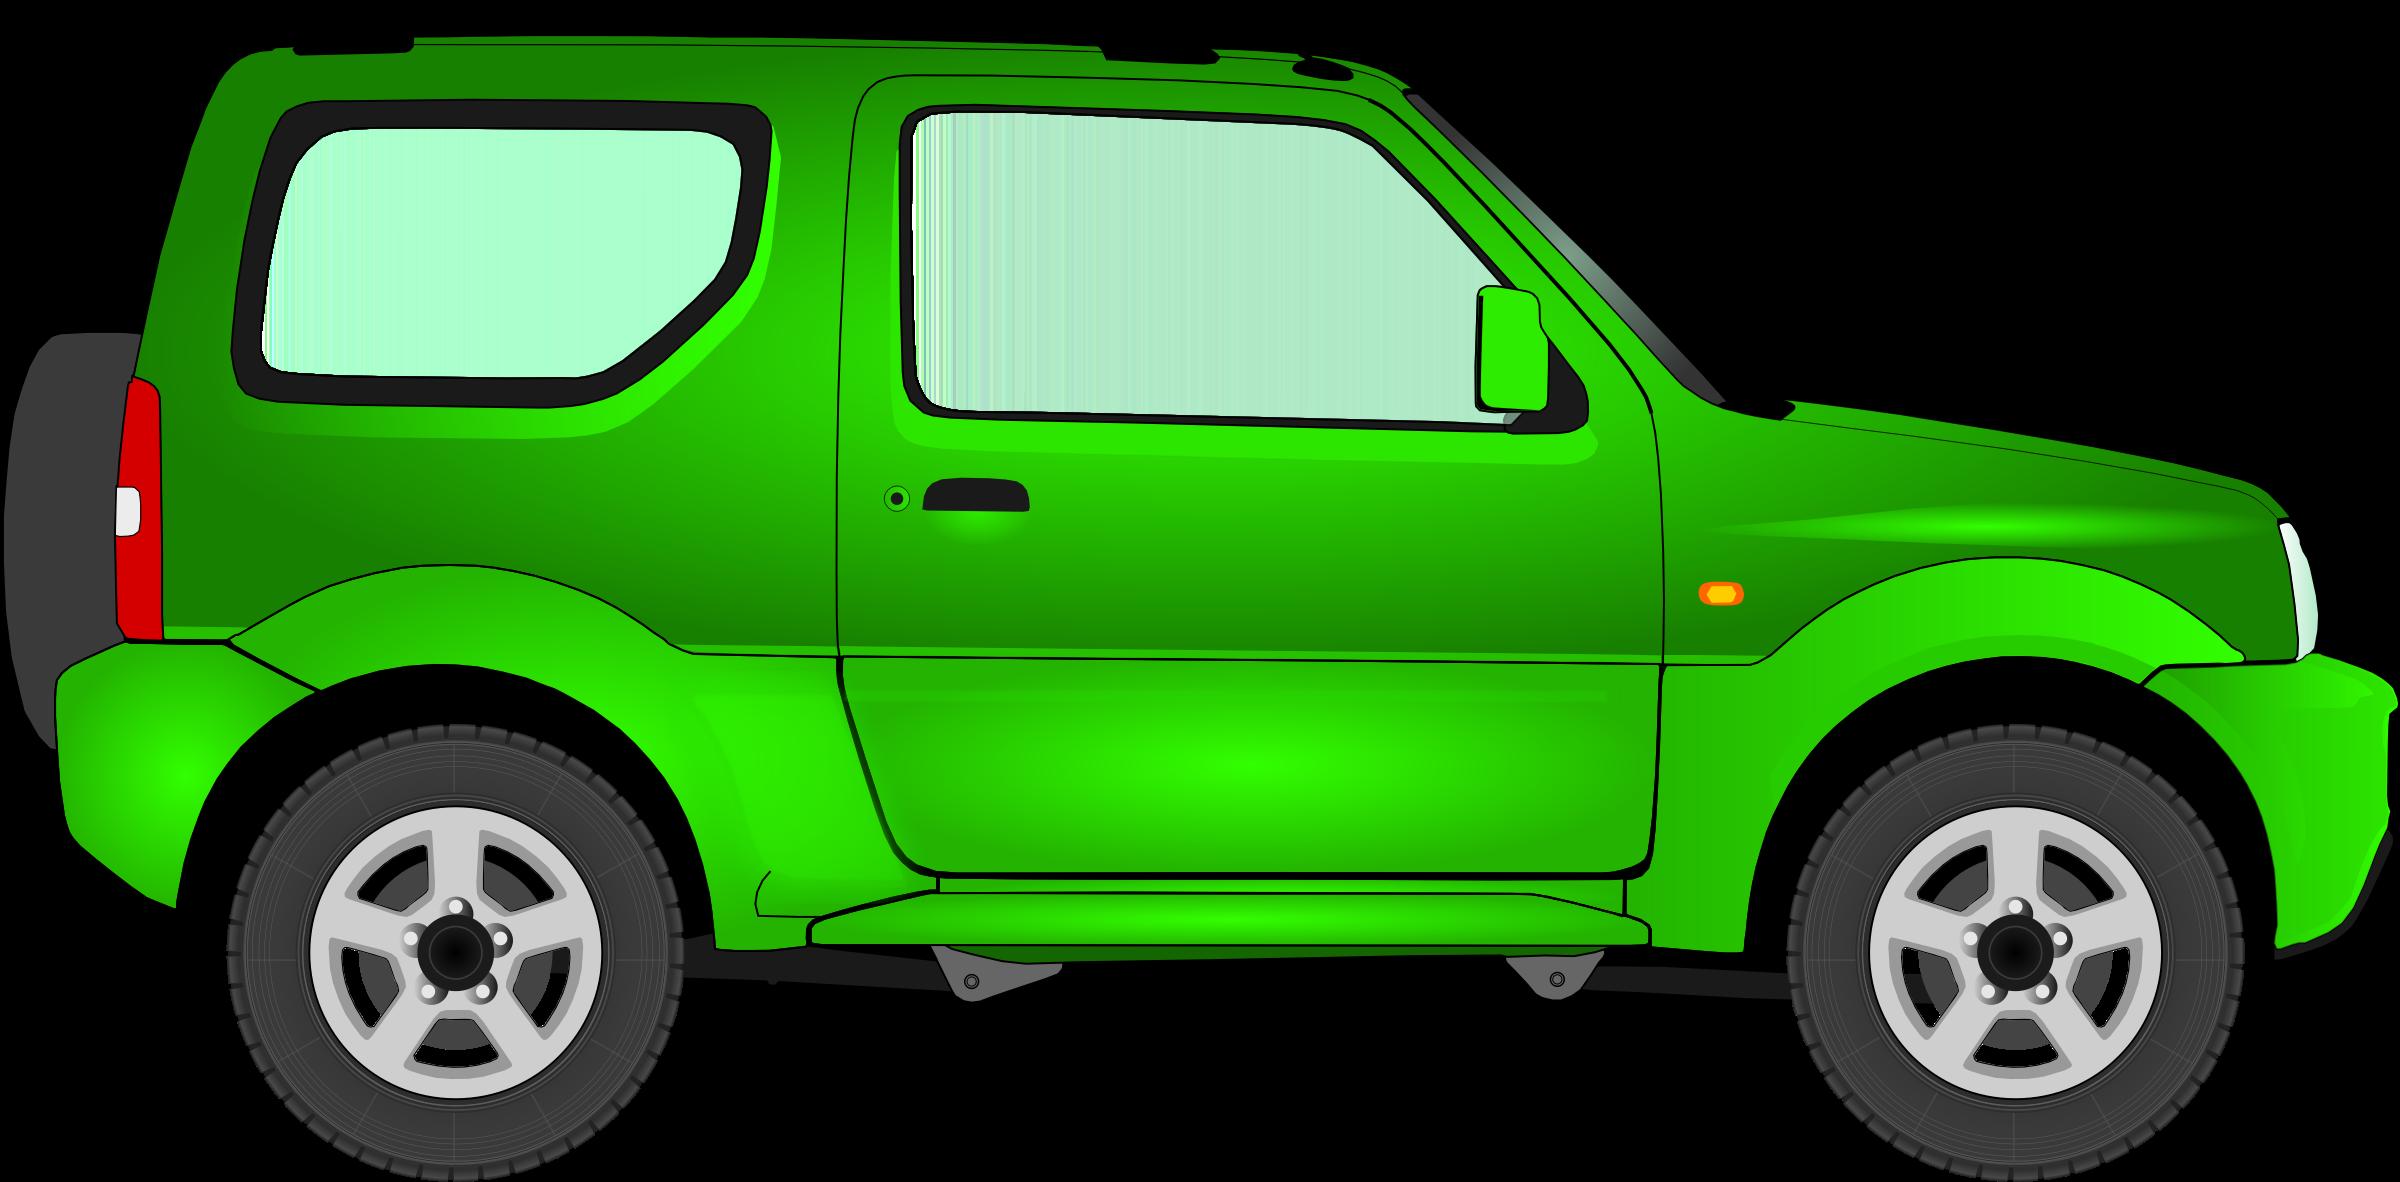 Clipart car transparent jpg black and white Clipart - Car 15 (green) jpg black and white